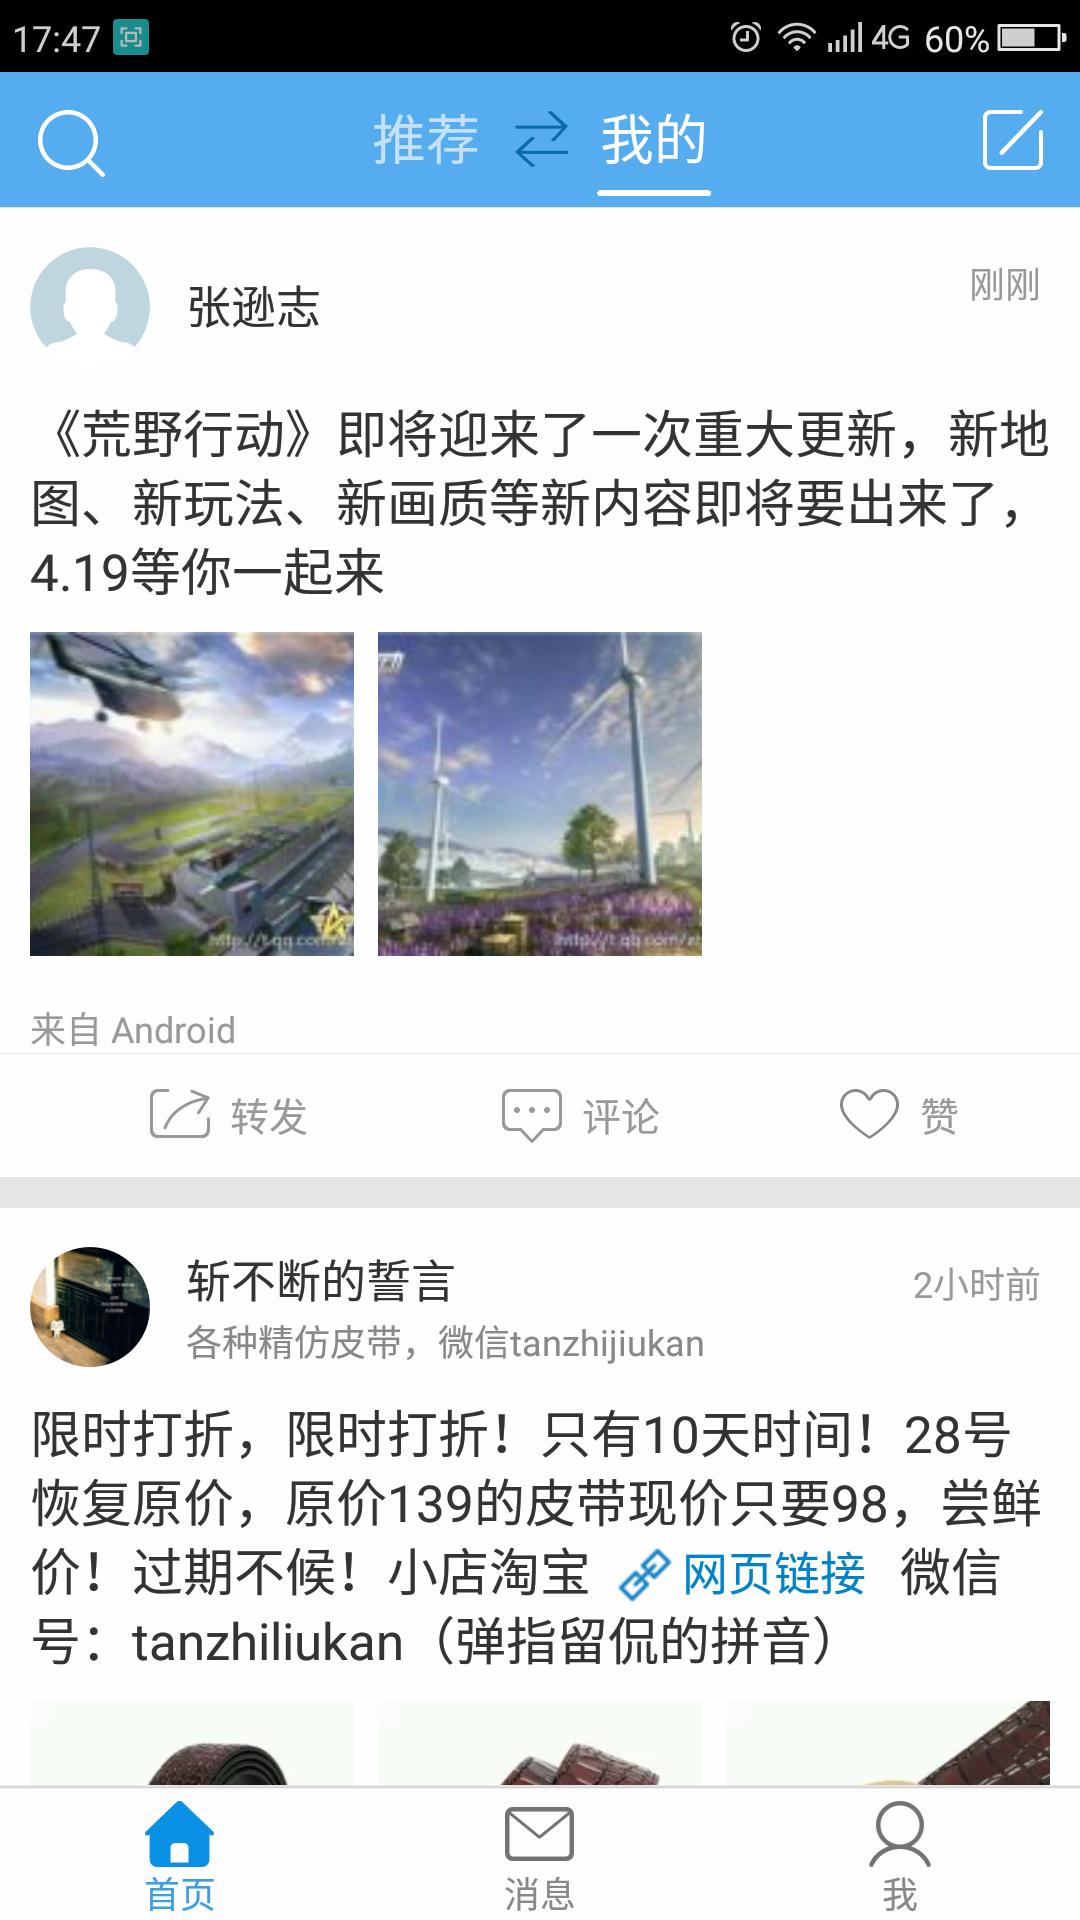 QQ图片20180418175800.png